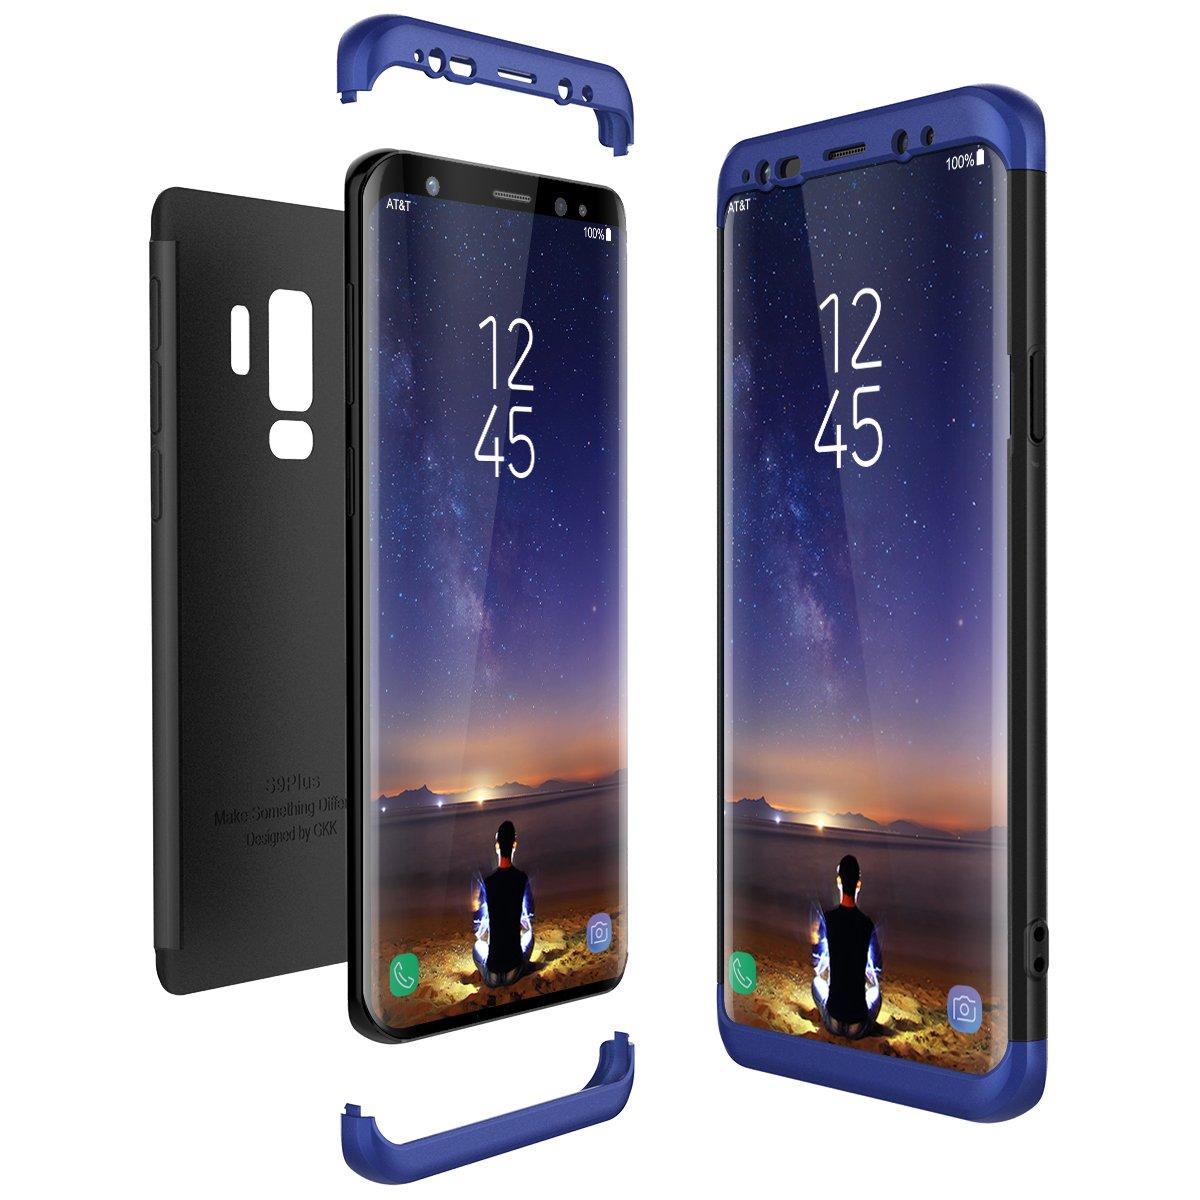 Samsung Galaxy S9 Plus S9+ Hülle, CE-Link Hardcase 3 in 1 Handyhülle Ultra Dünn Hartschale 360 Grad Full Body Schutz 3 Teilig Styliche Handytasche Backcover Schutzhülle Anti-Kratzer Elegant Stoßfest Hart PC Skin Rückdeckel Bumper - Rose Gold